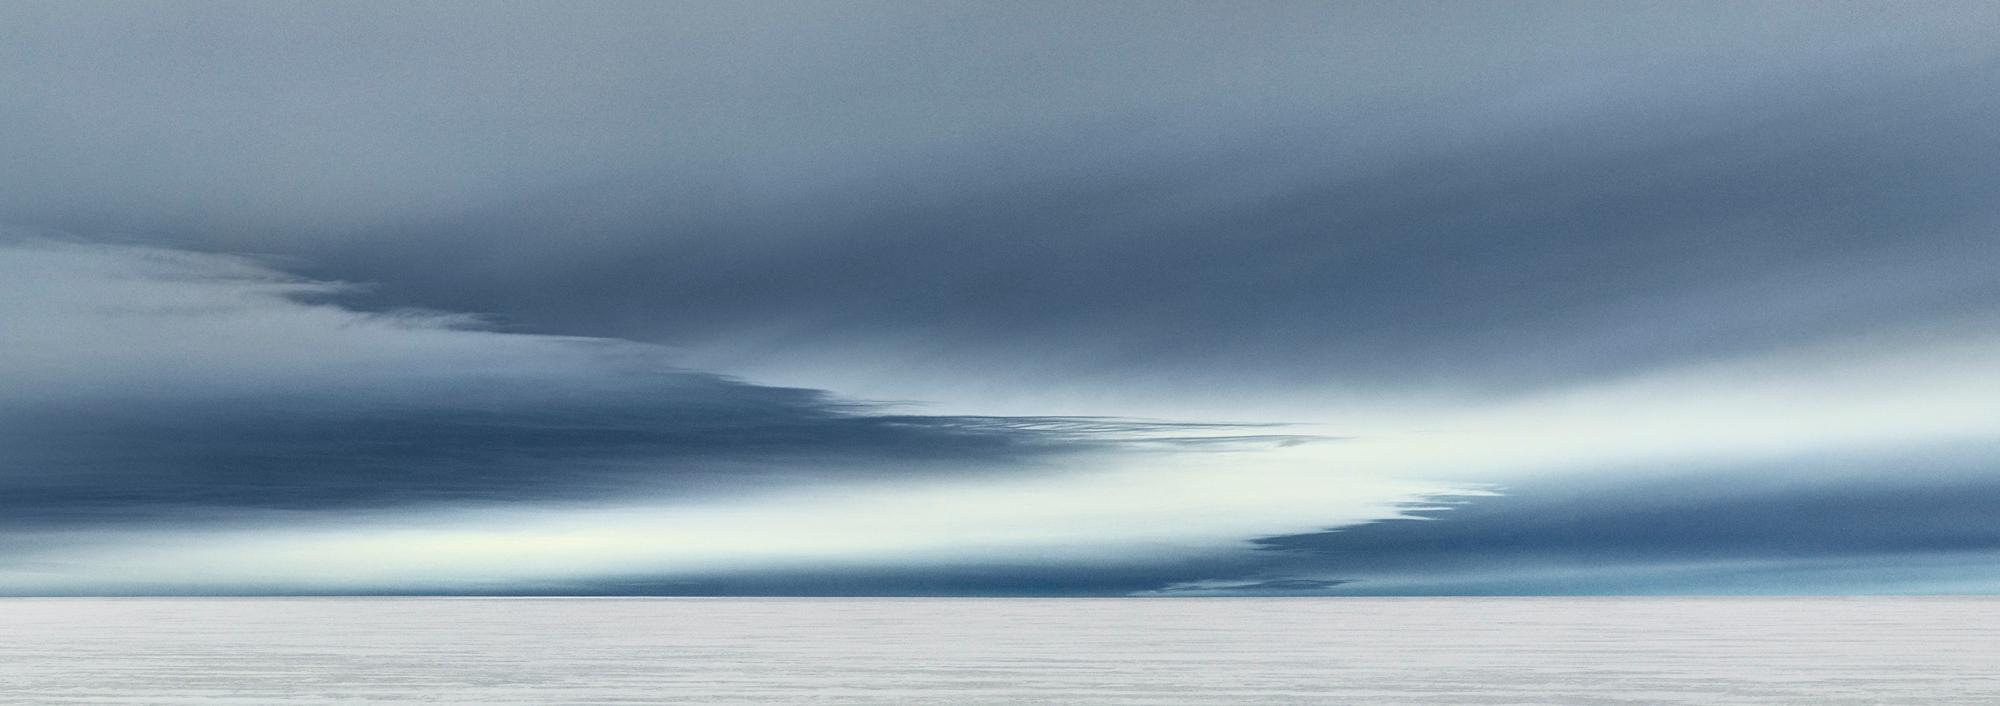 Icesheet #2338, 50cm x 140cm, Digital Pigment Print, Edition of 7, 2013